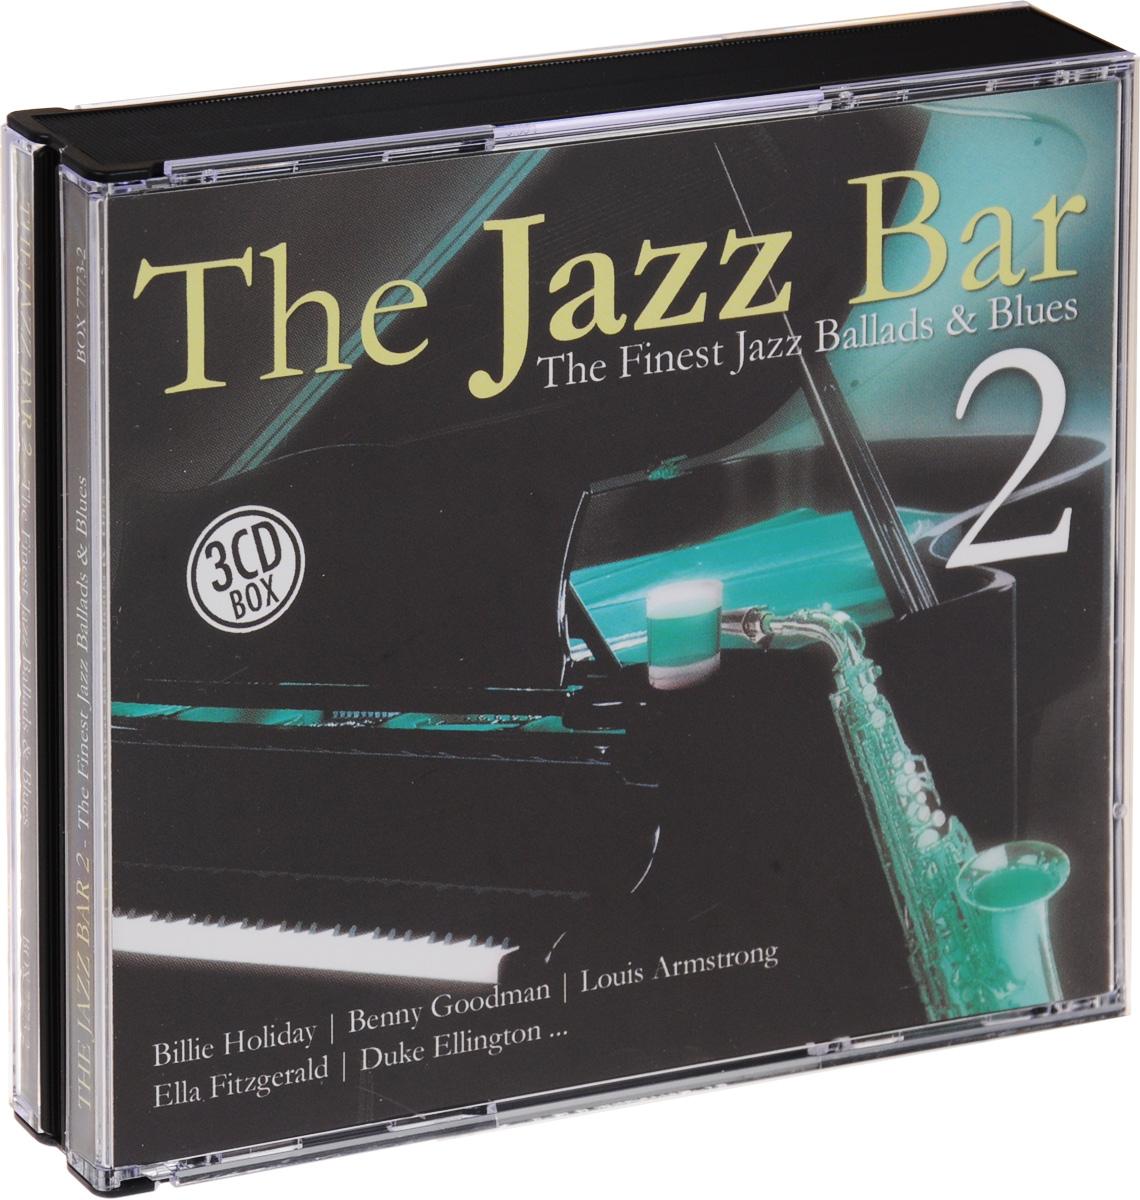 The Jazz Bar 2. The Finest Jazz Ballads & Blues (3 CD) бонни тайлер робин бэк gotthard exilia гэри мур the poison hammerfall silverlane rage лив кристин believe in me the finest rock ballads